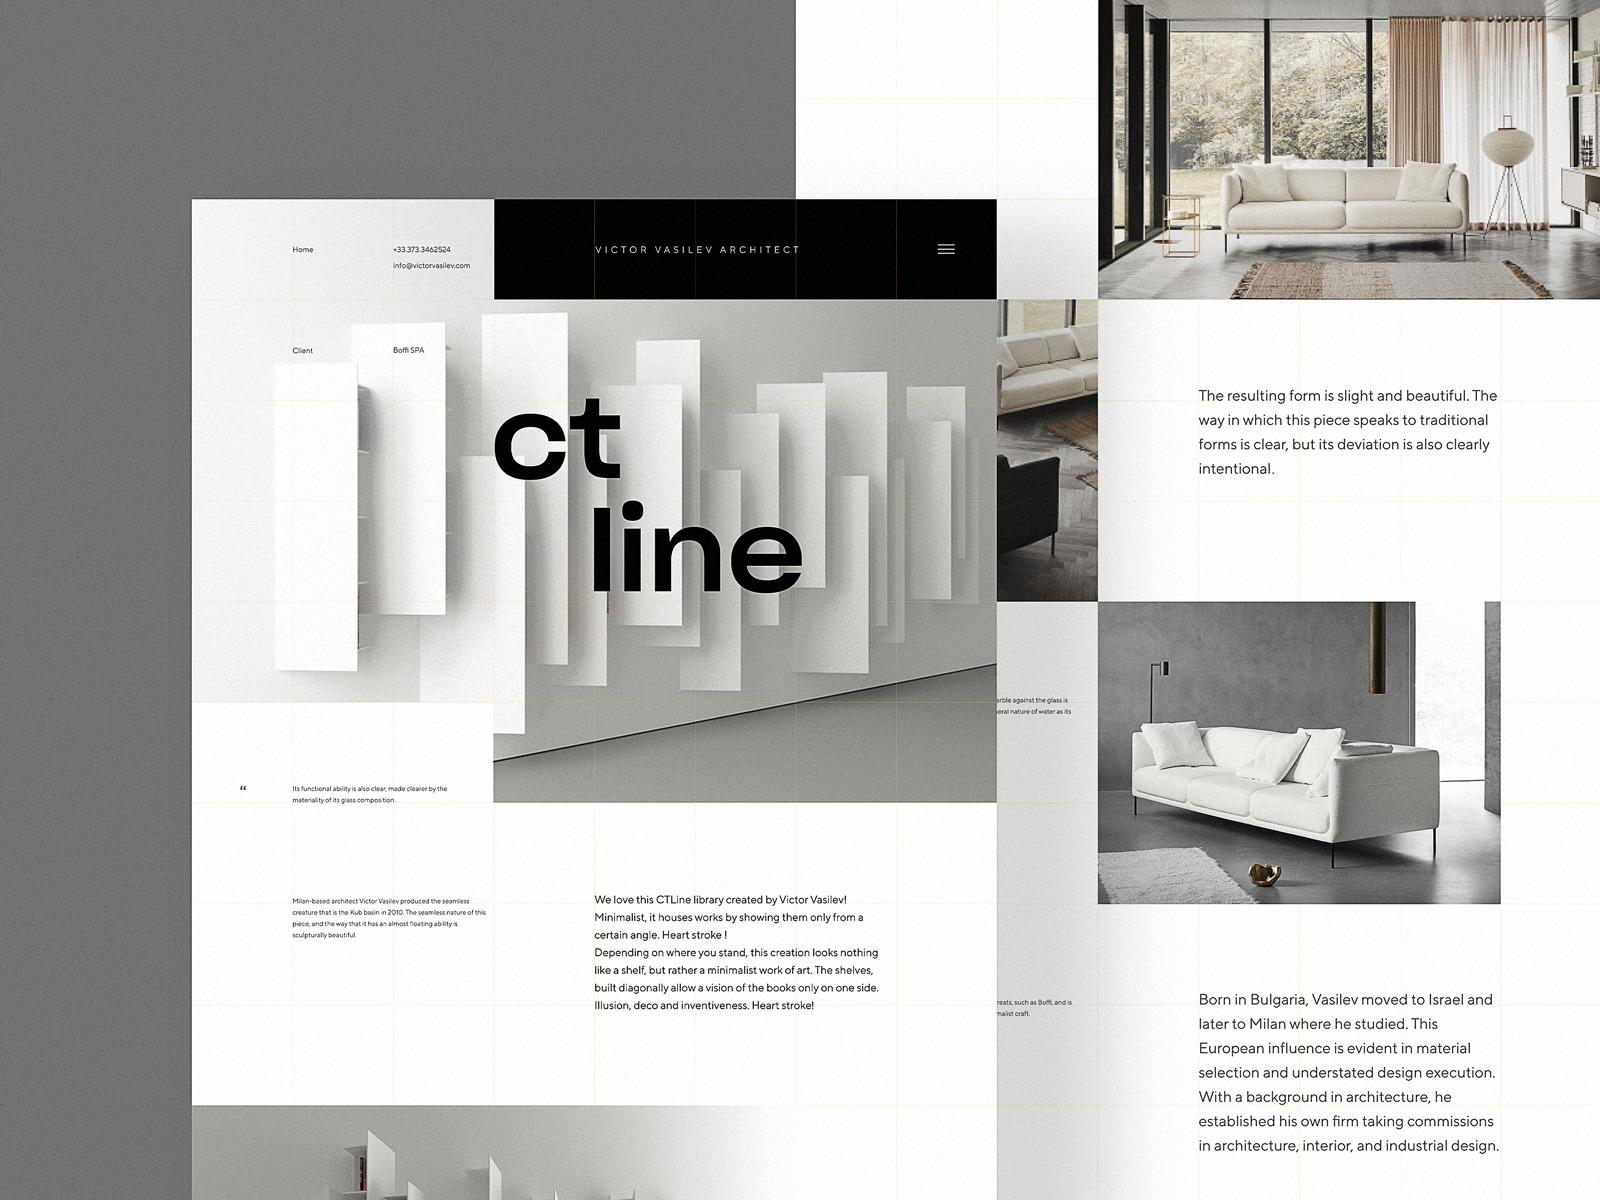 furniture design project